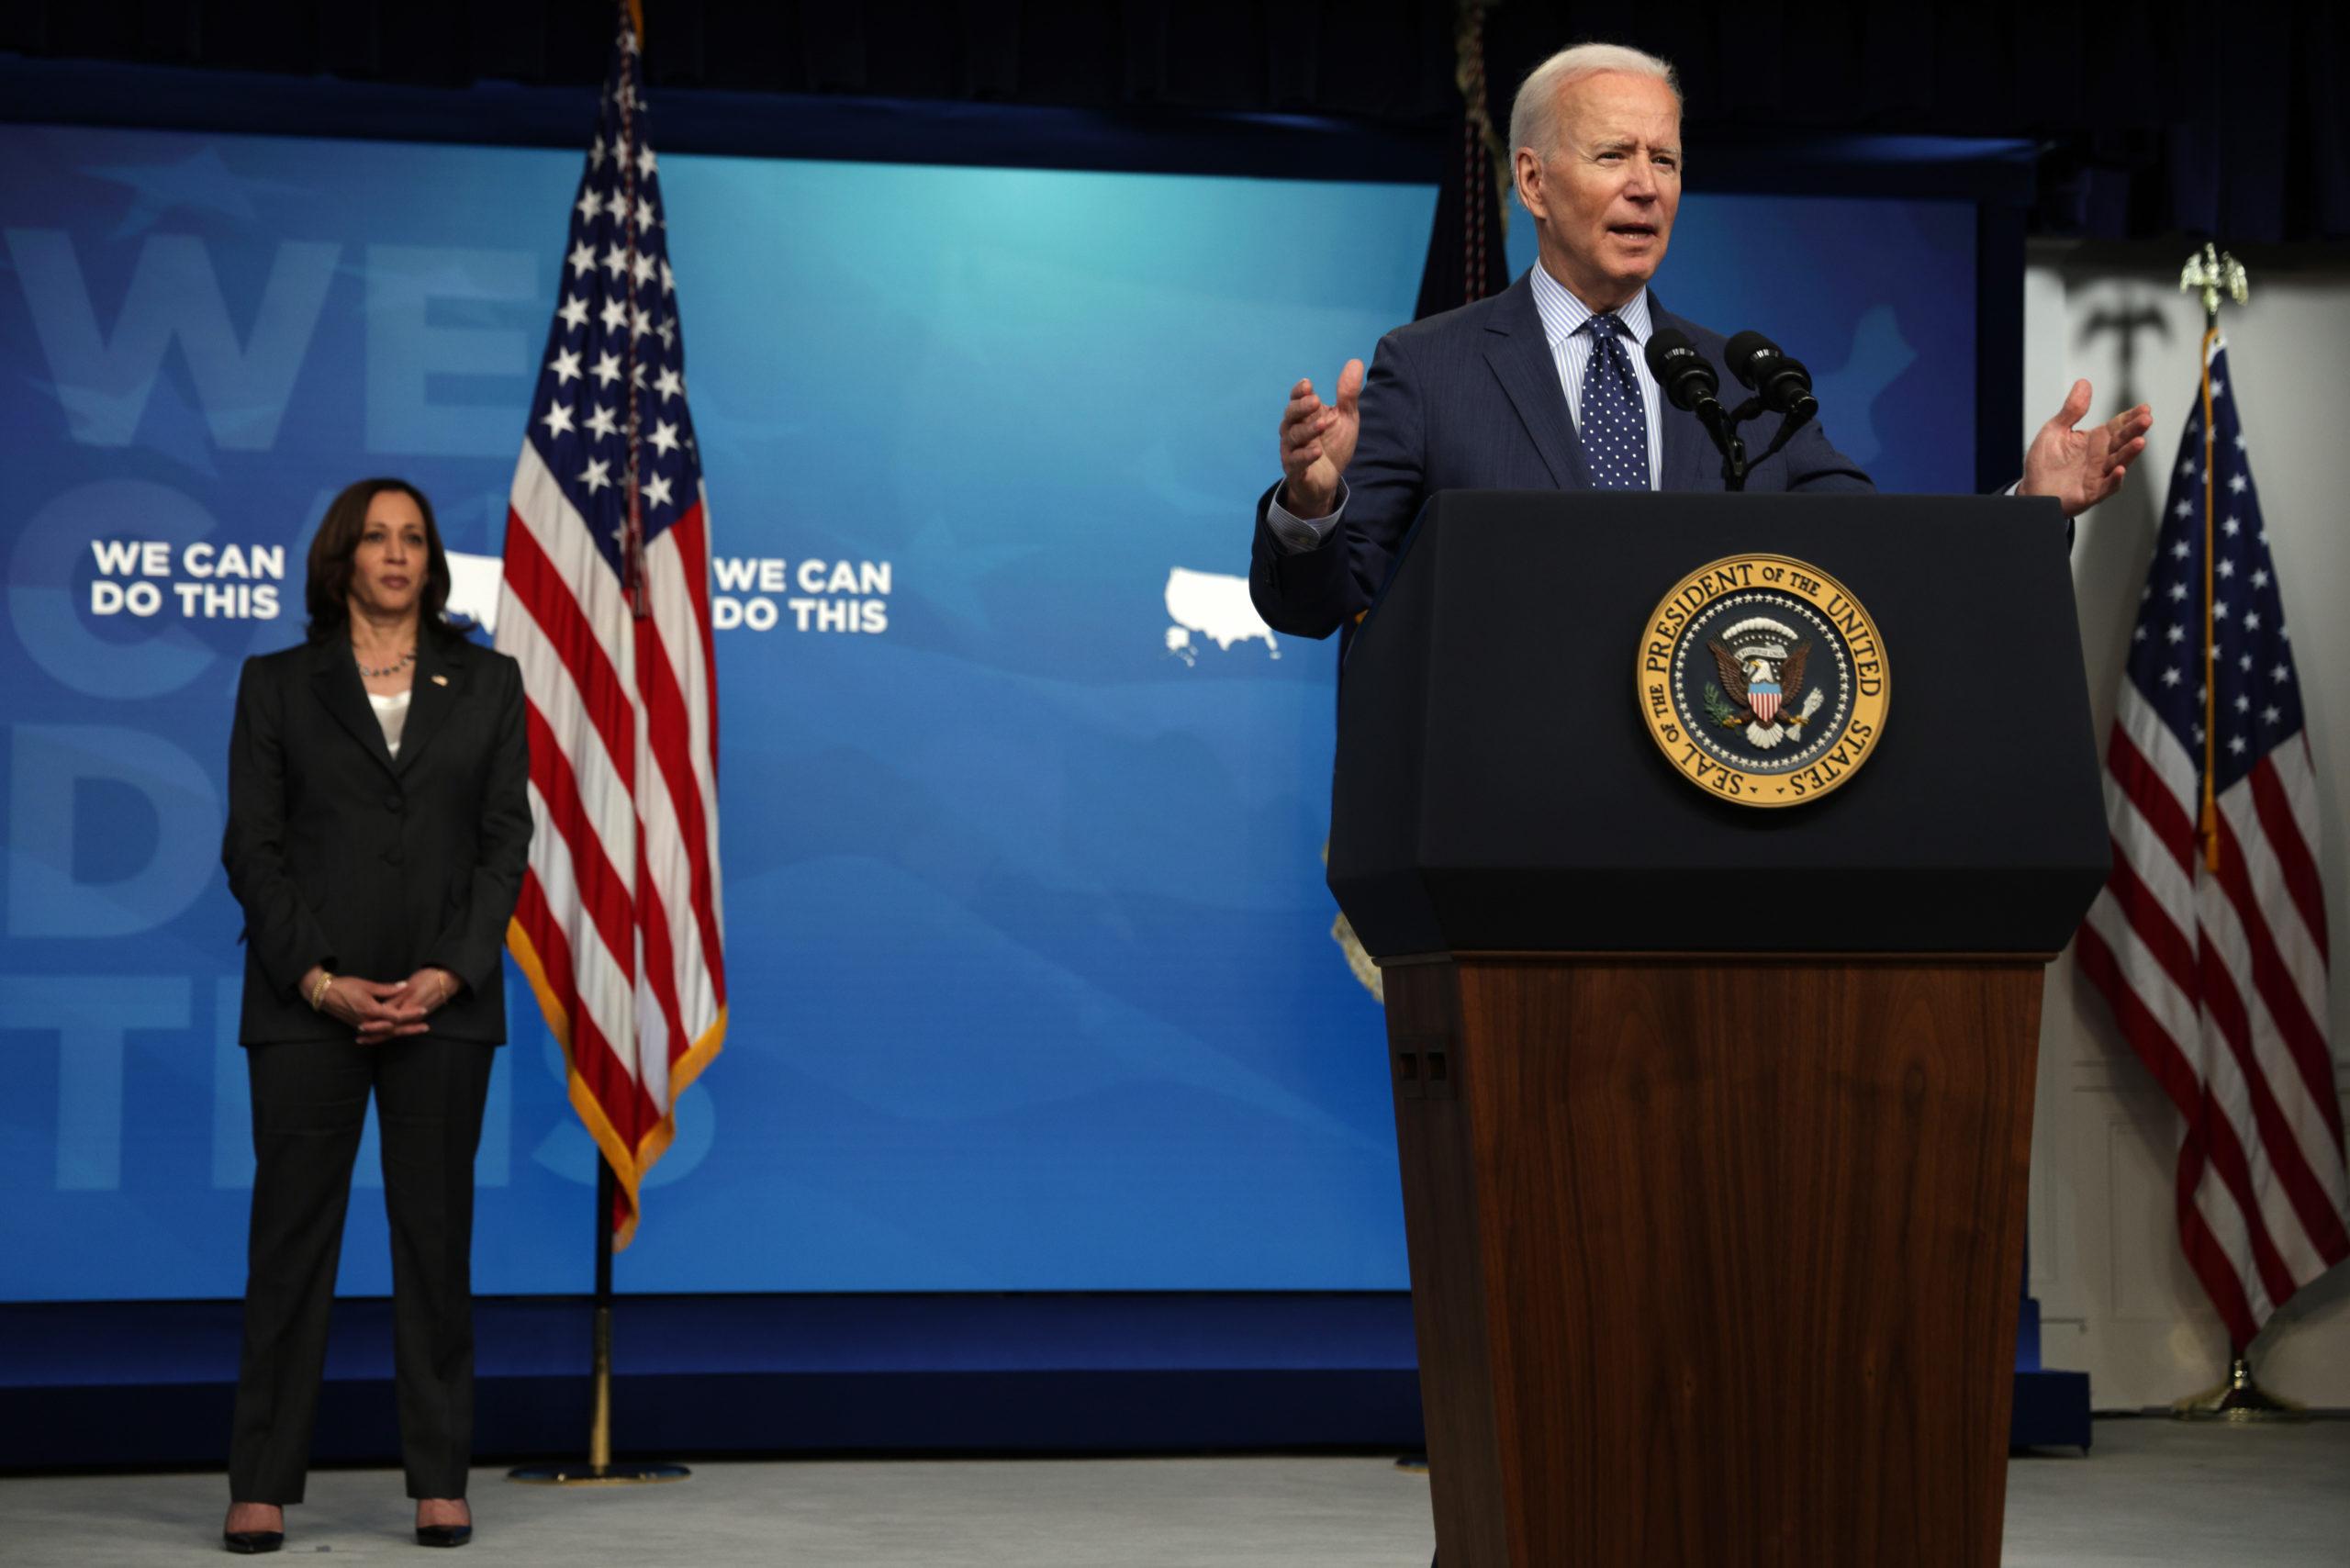 President Joe Biden speaks at the White House on Wednesday. (Alex Wong/Getty Images)